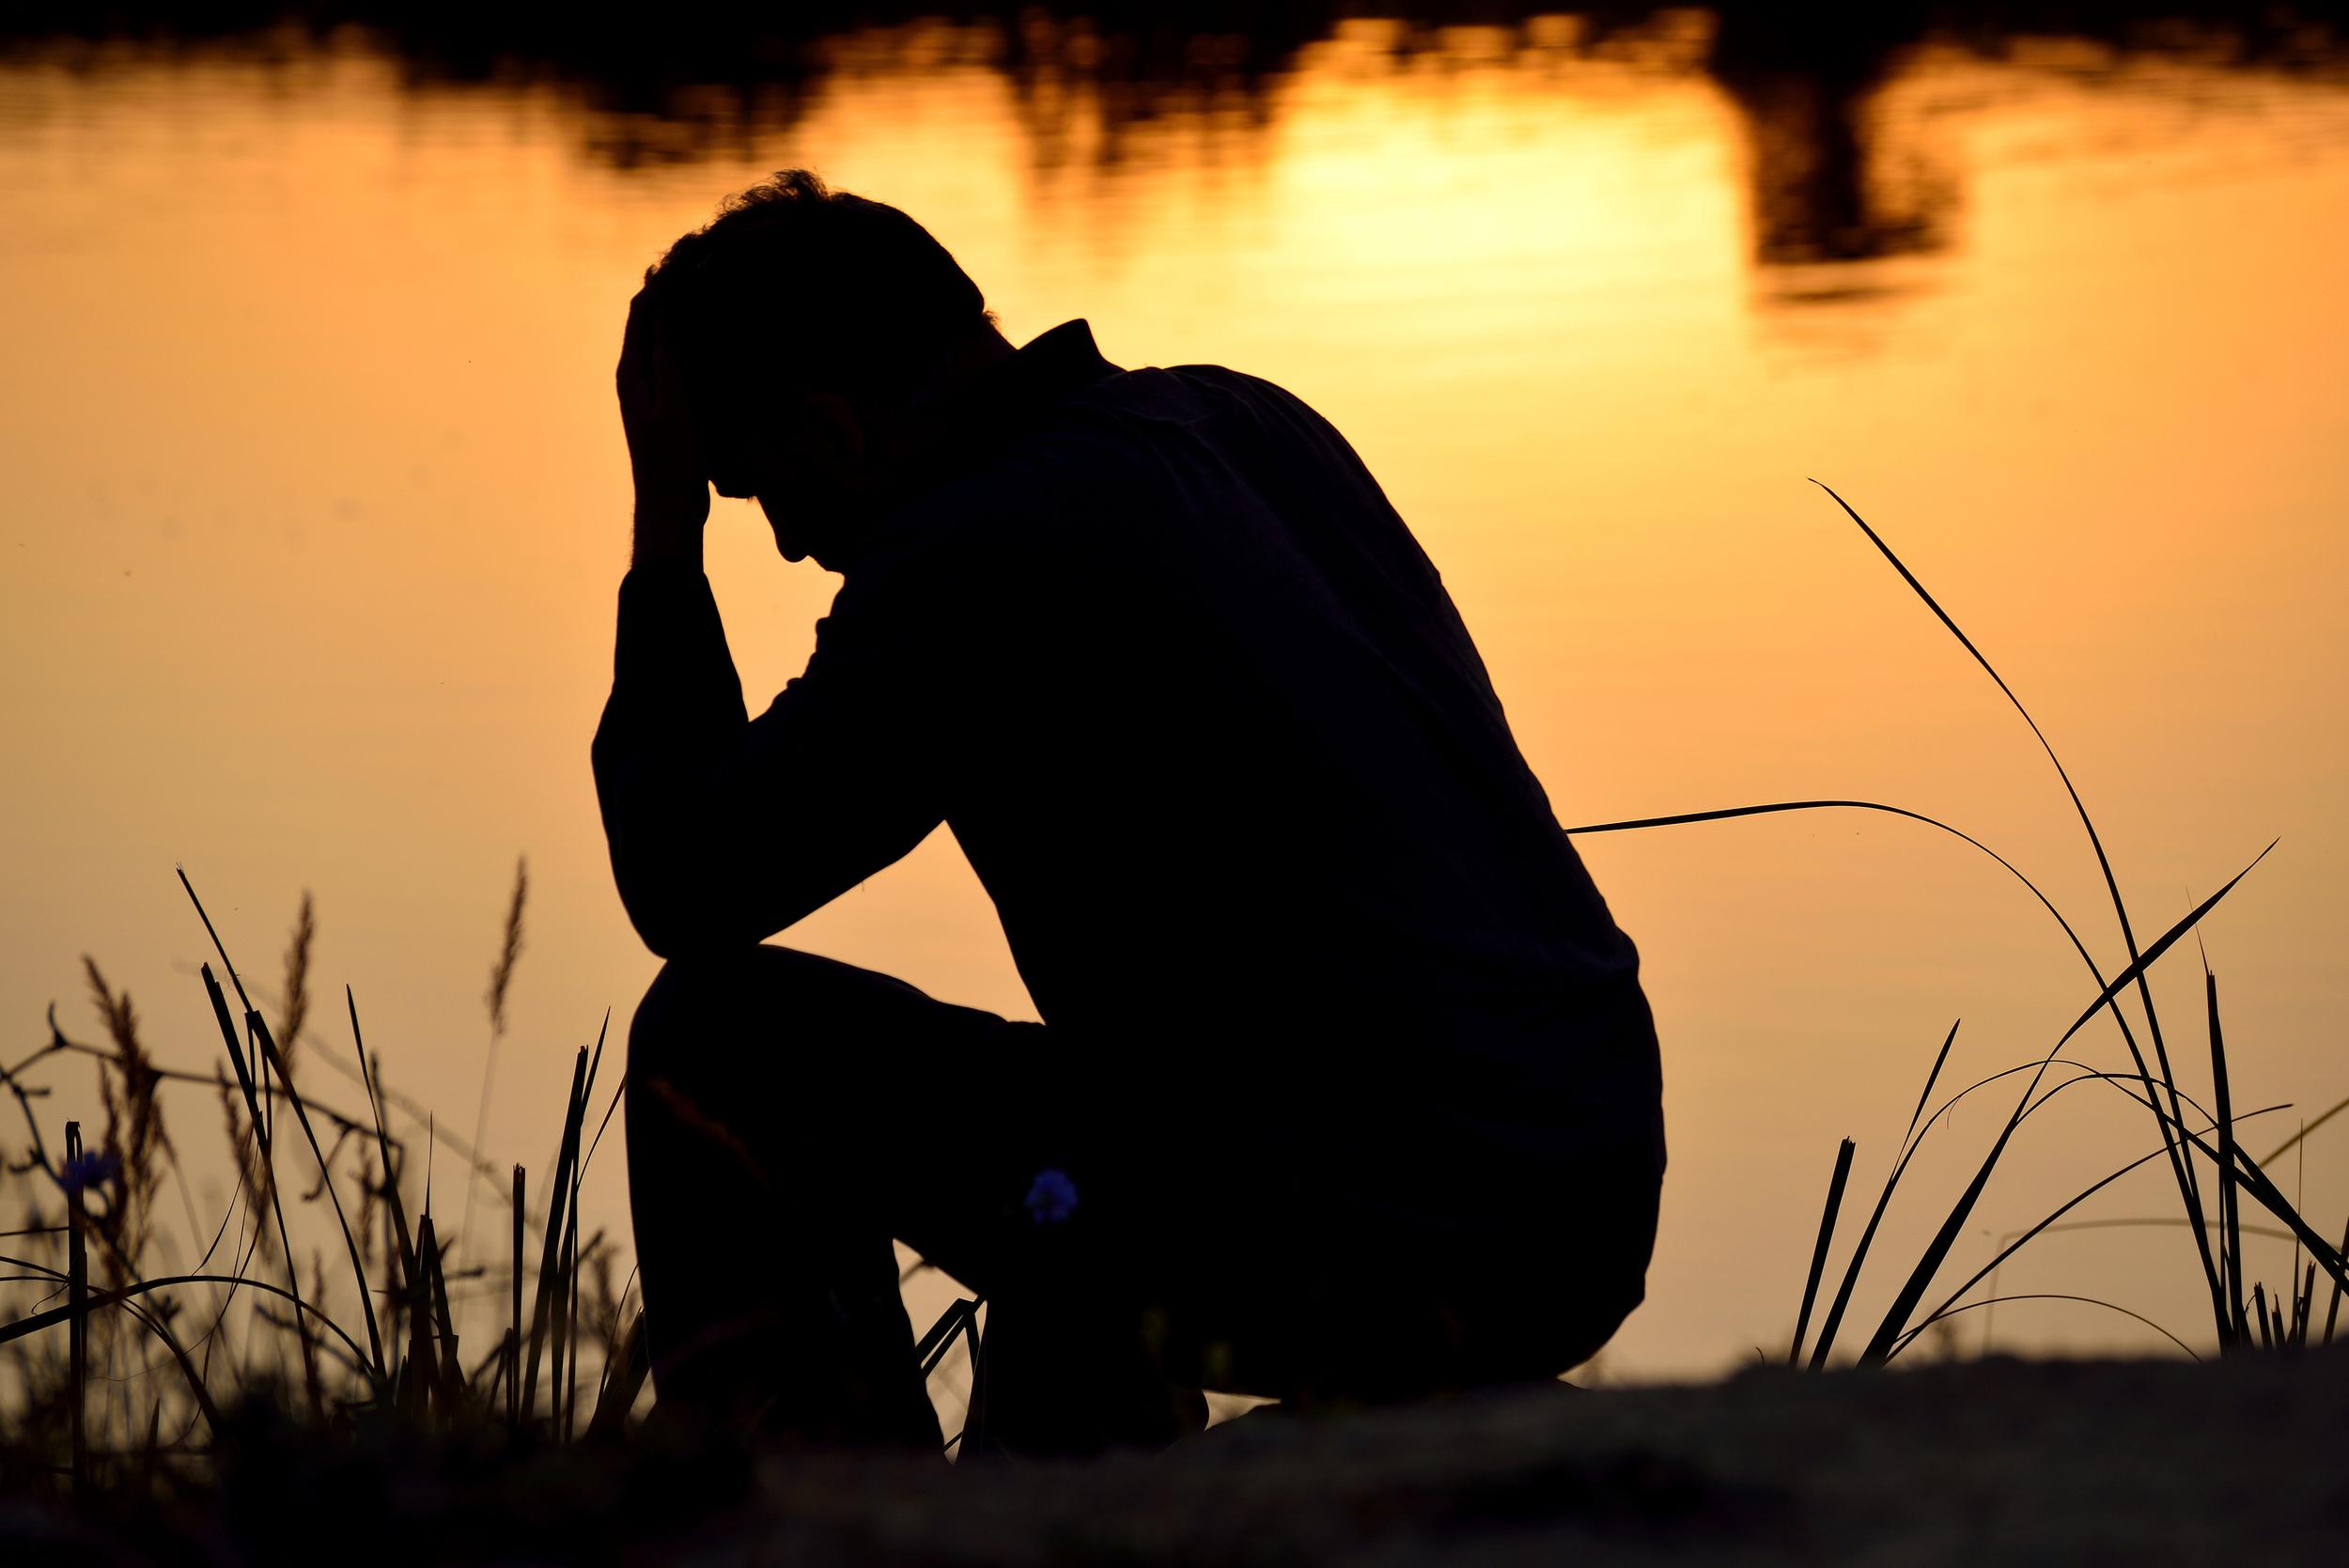 bigstock-Depressed-Man-Sitting-On-Top-O-48751034.jpg